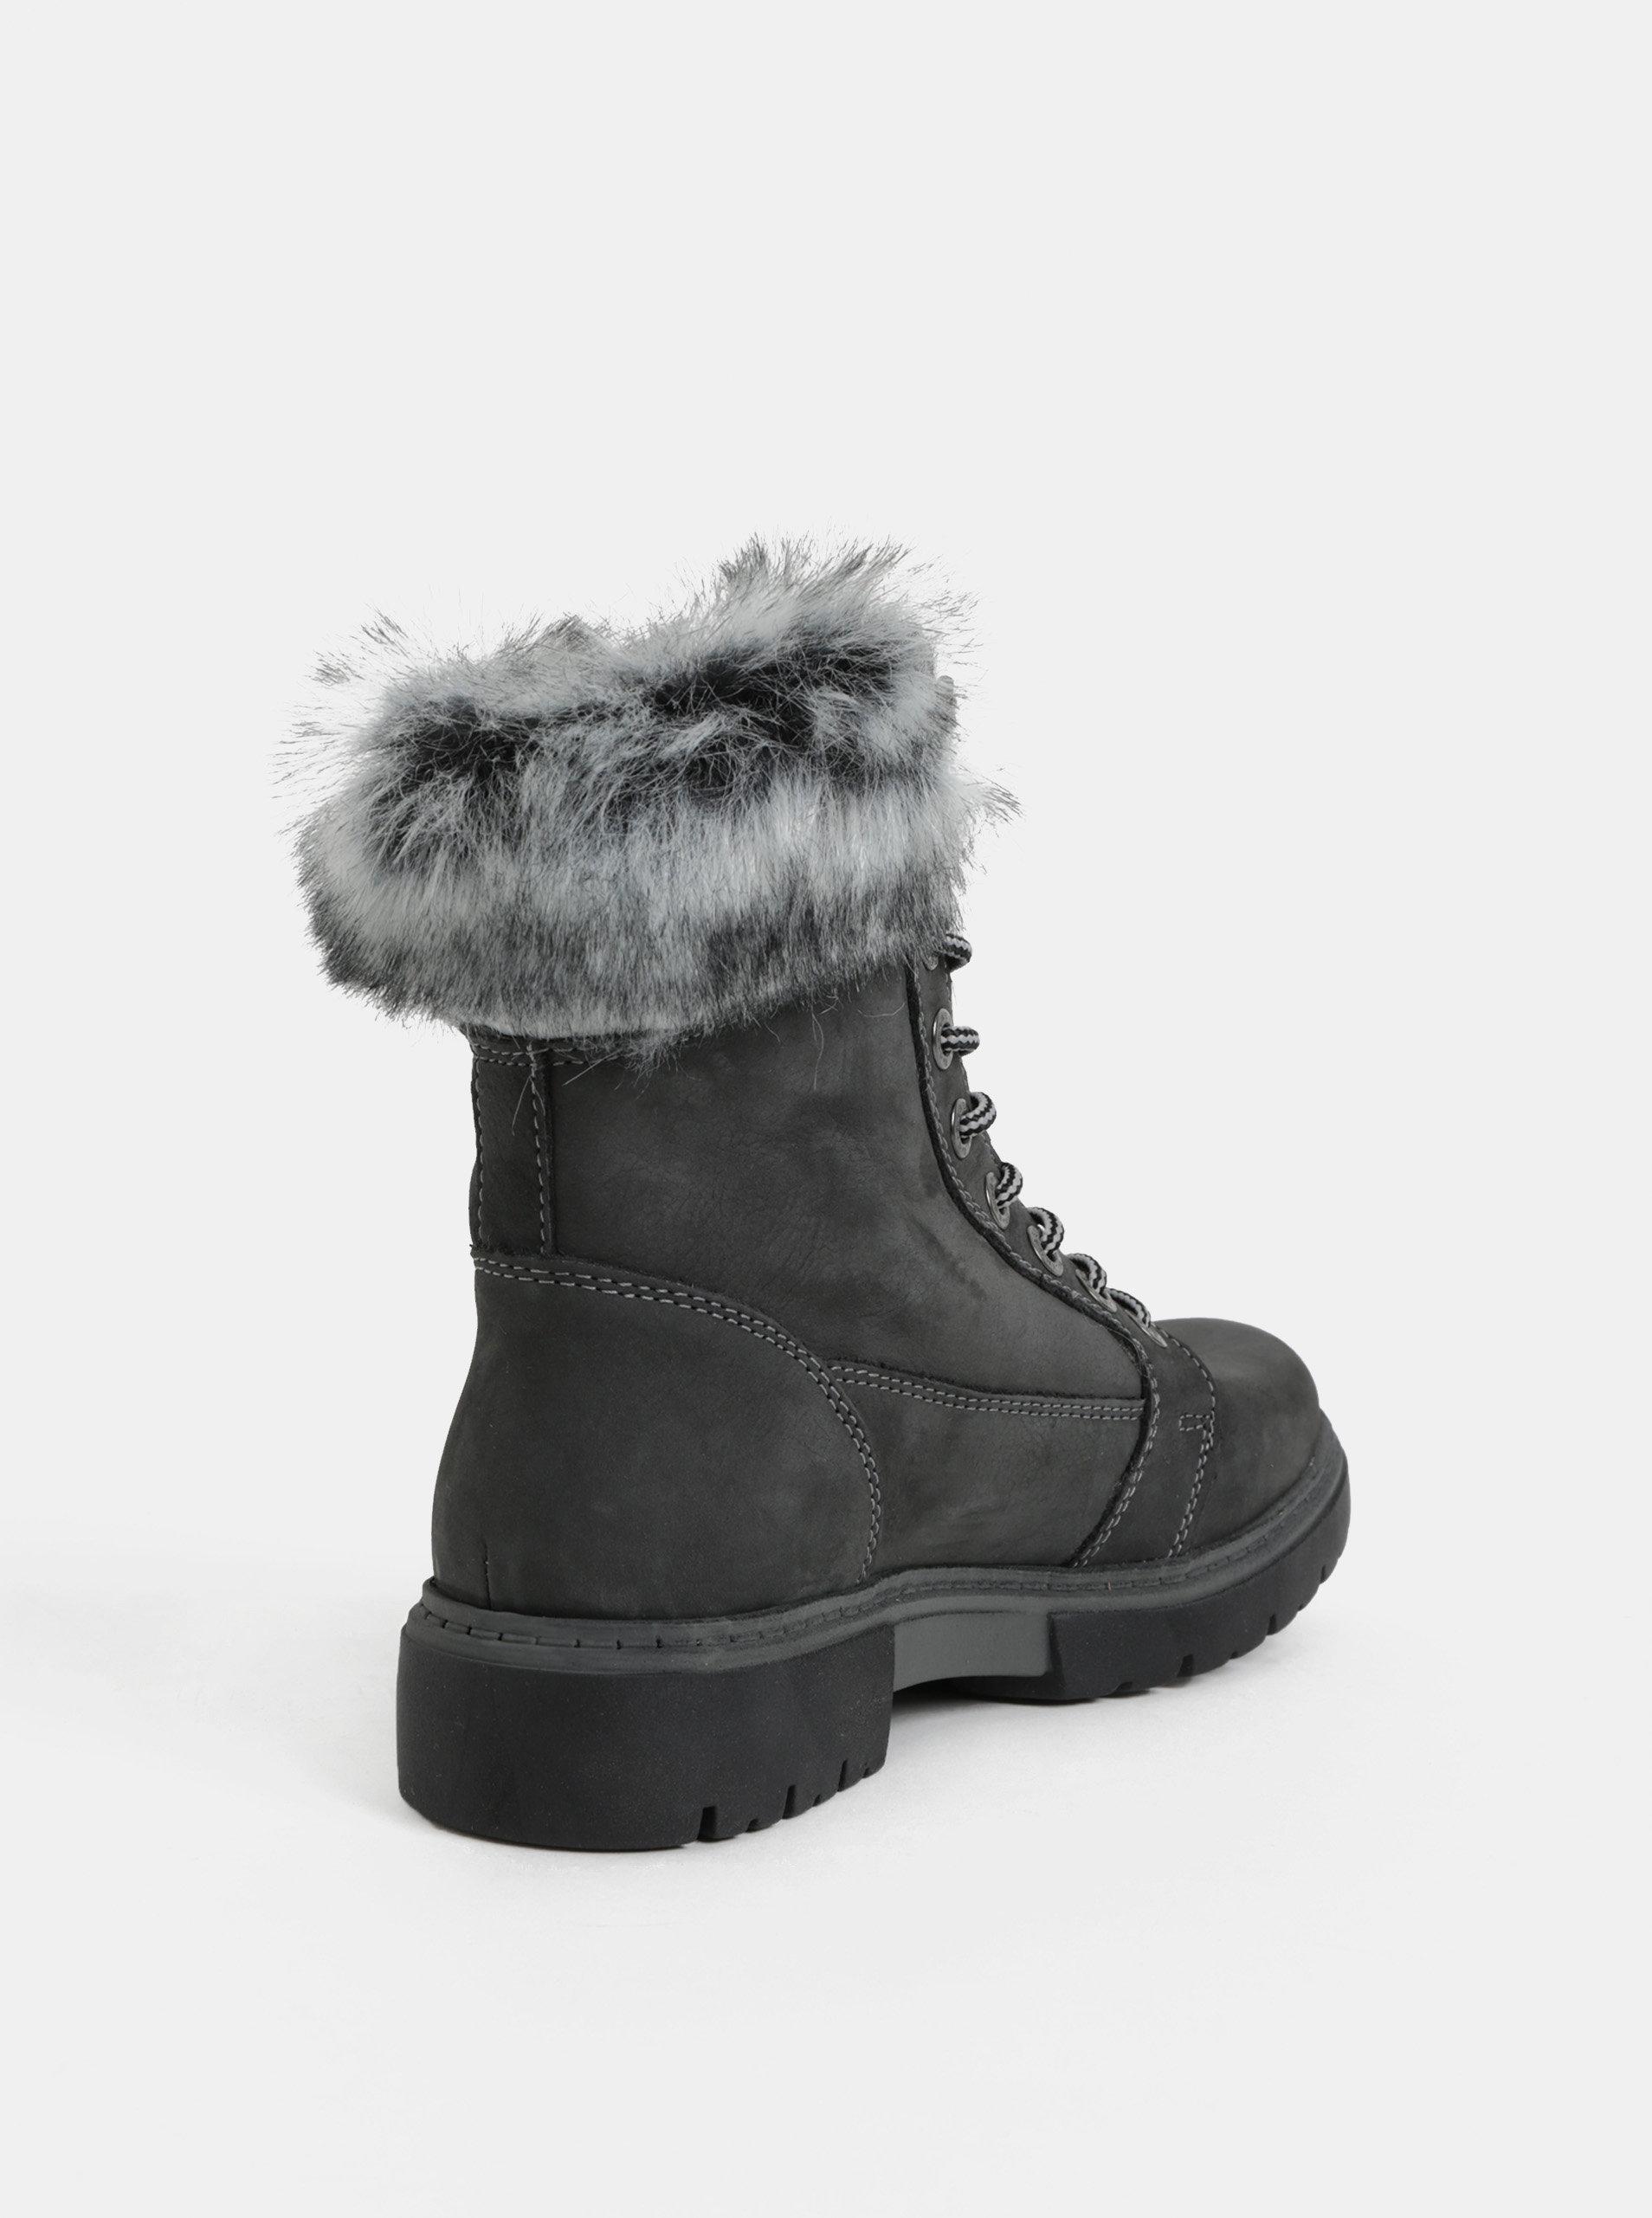 32d93fdcbbdb Sivé dámske zimné kožené členkové topánky s umelou kožušinkou Weinbrenner  ...